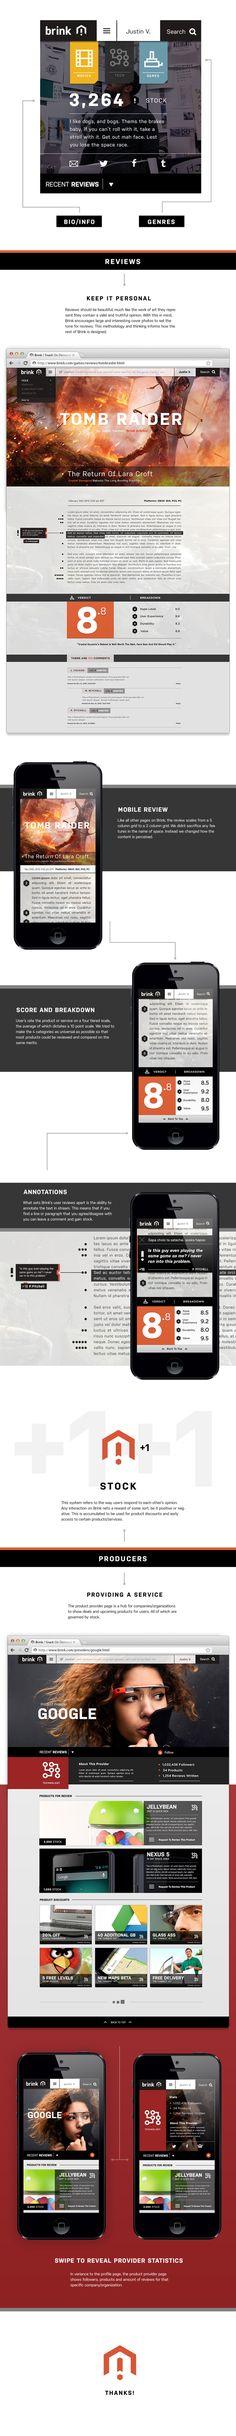 #mobile #ui #app #digital